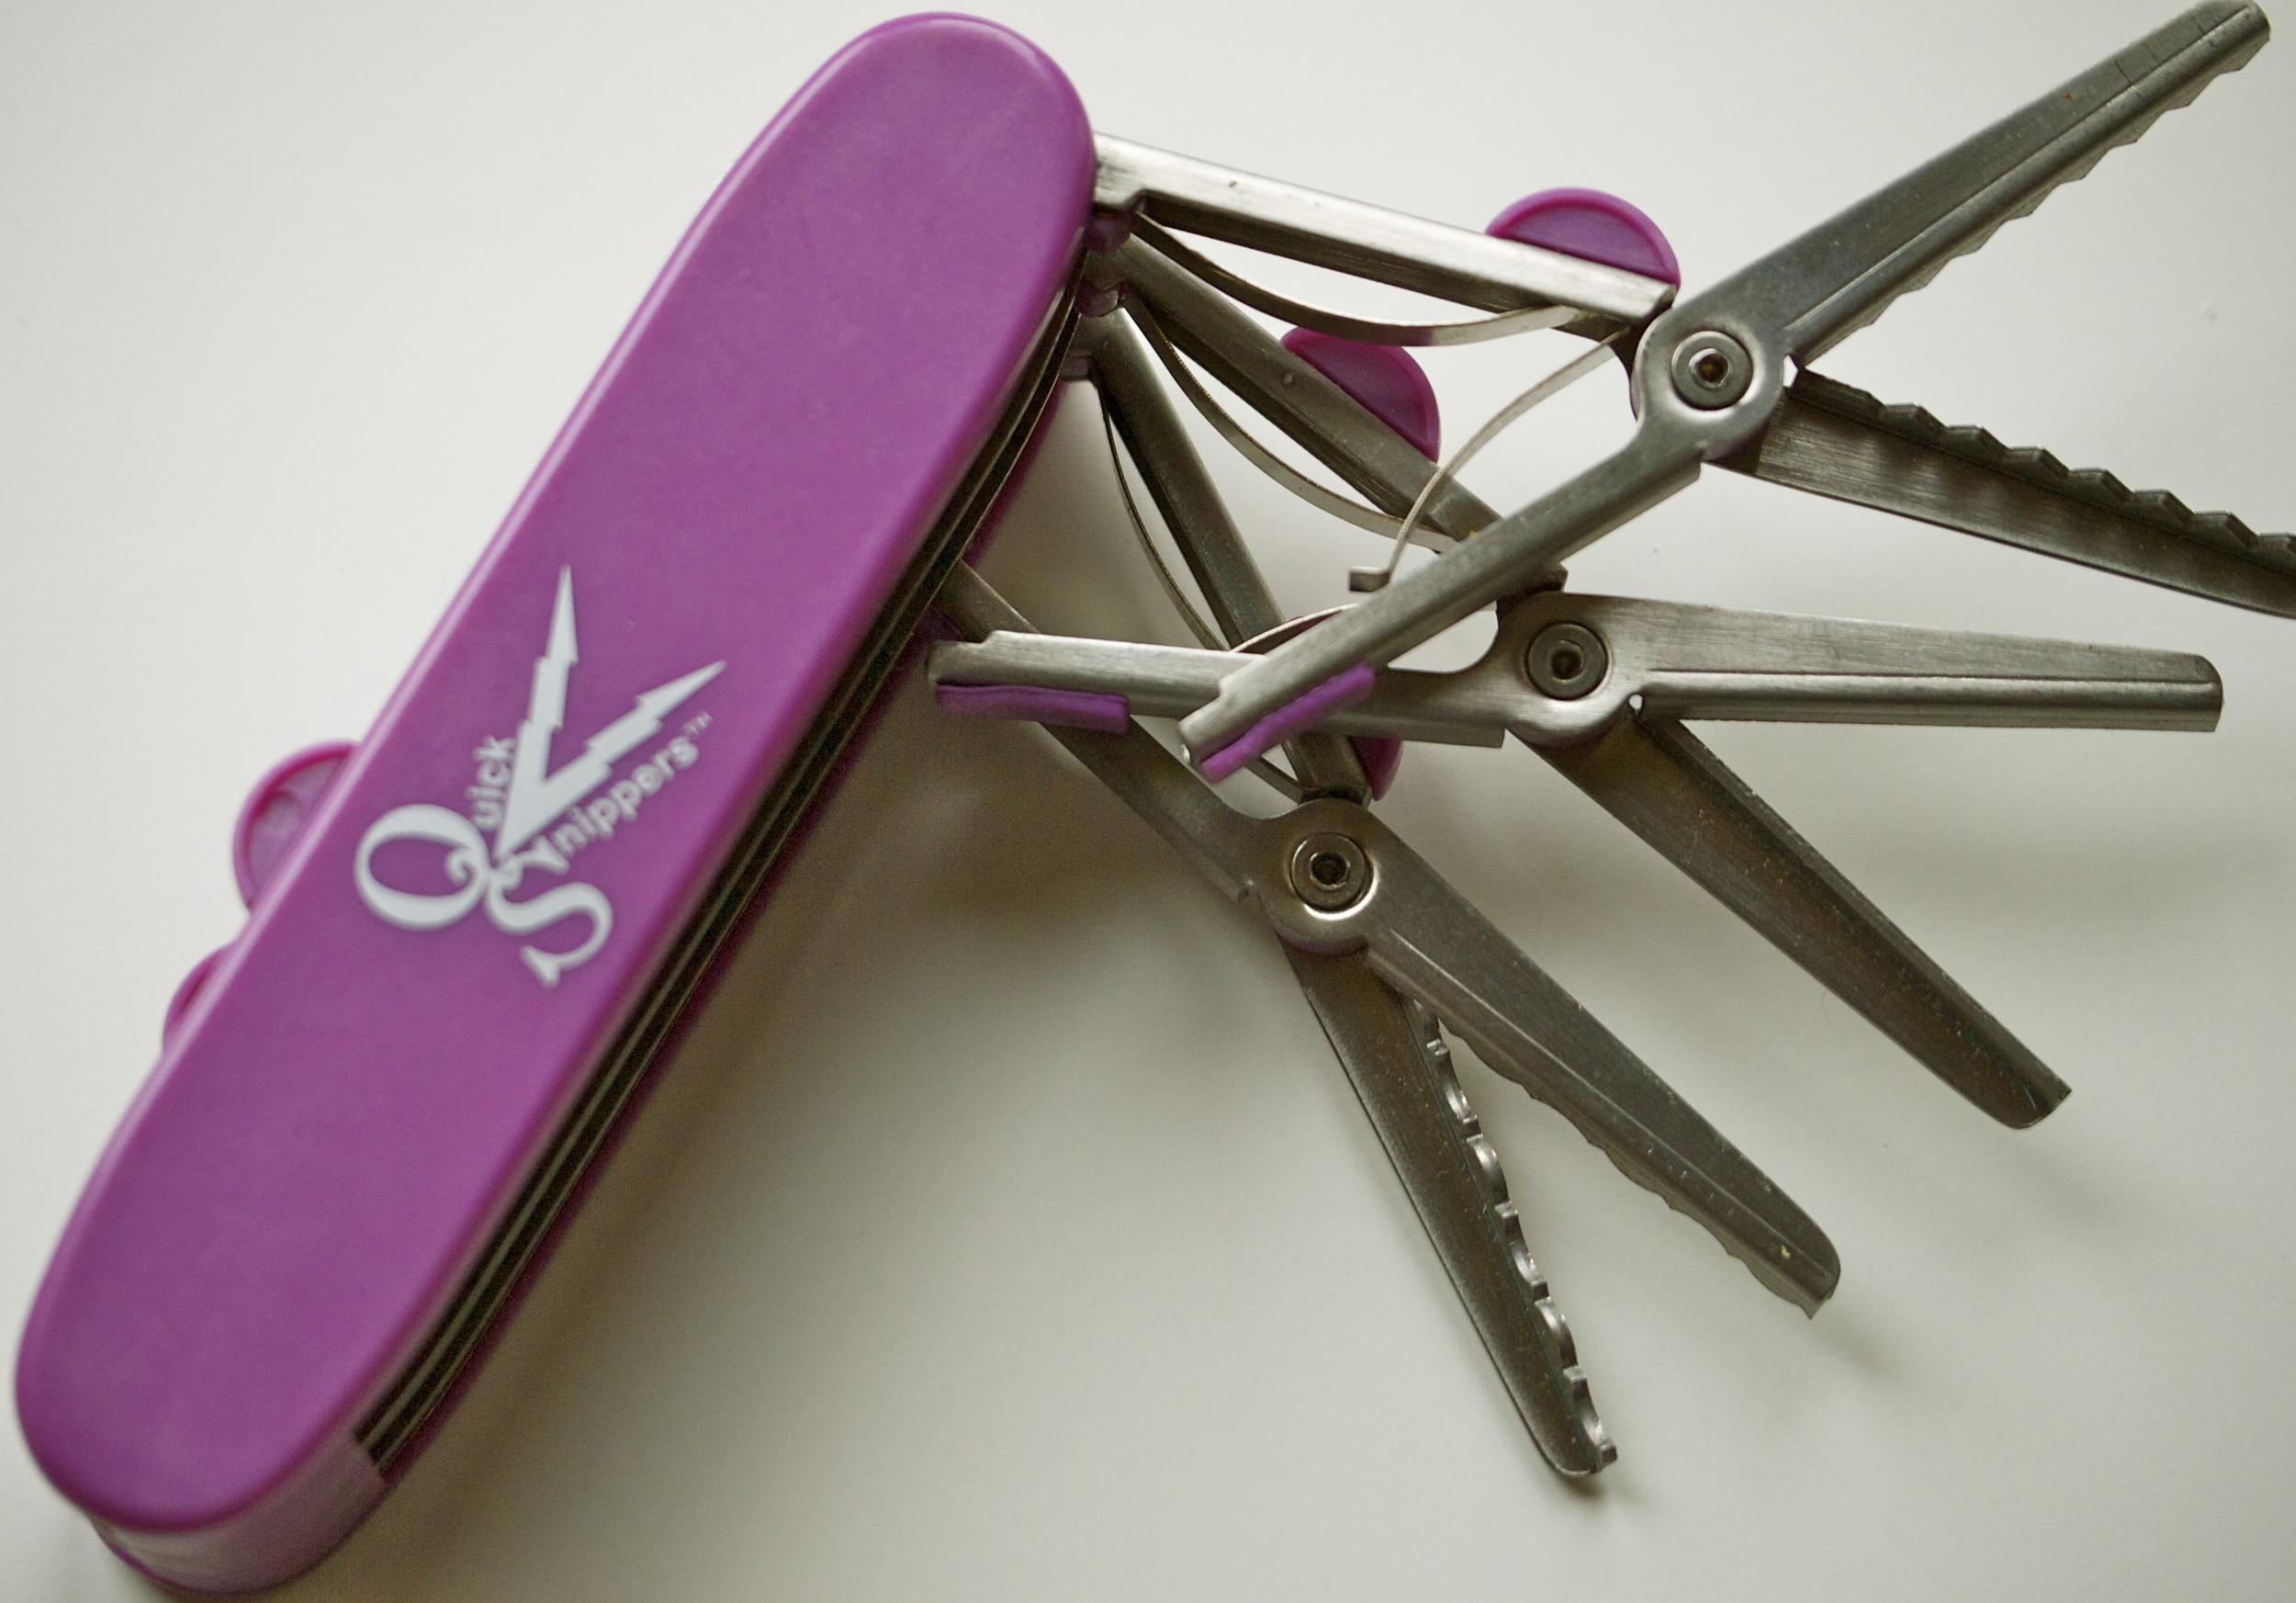 quick snippers scissors tool